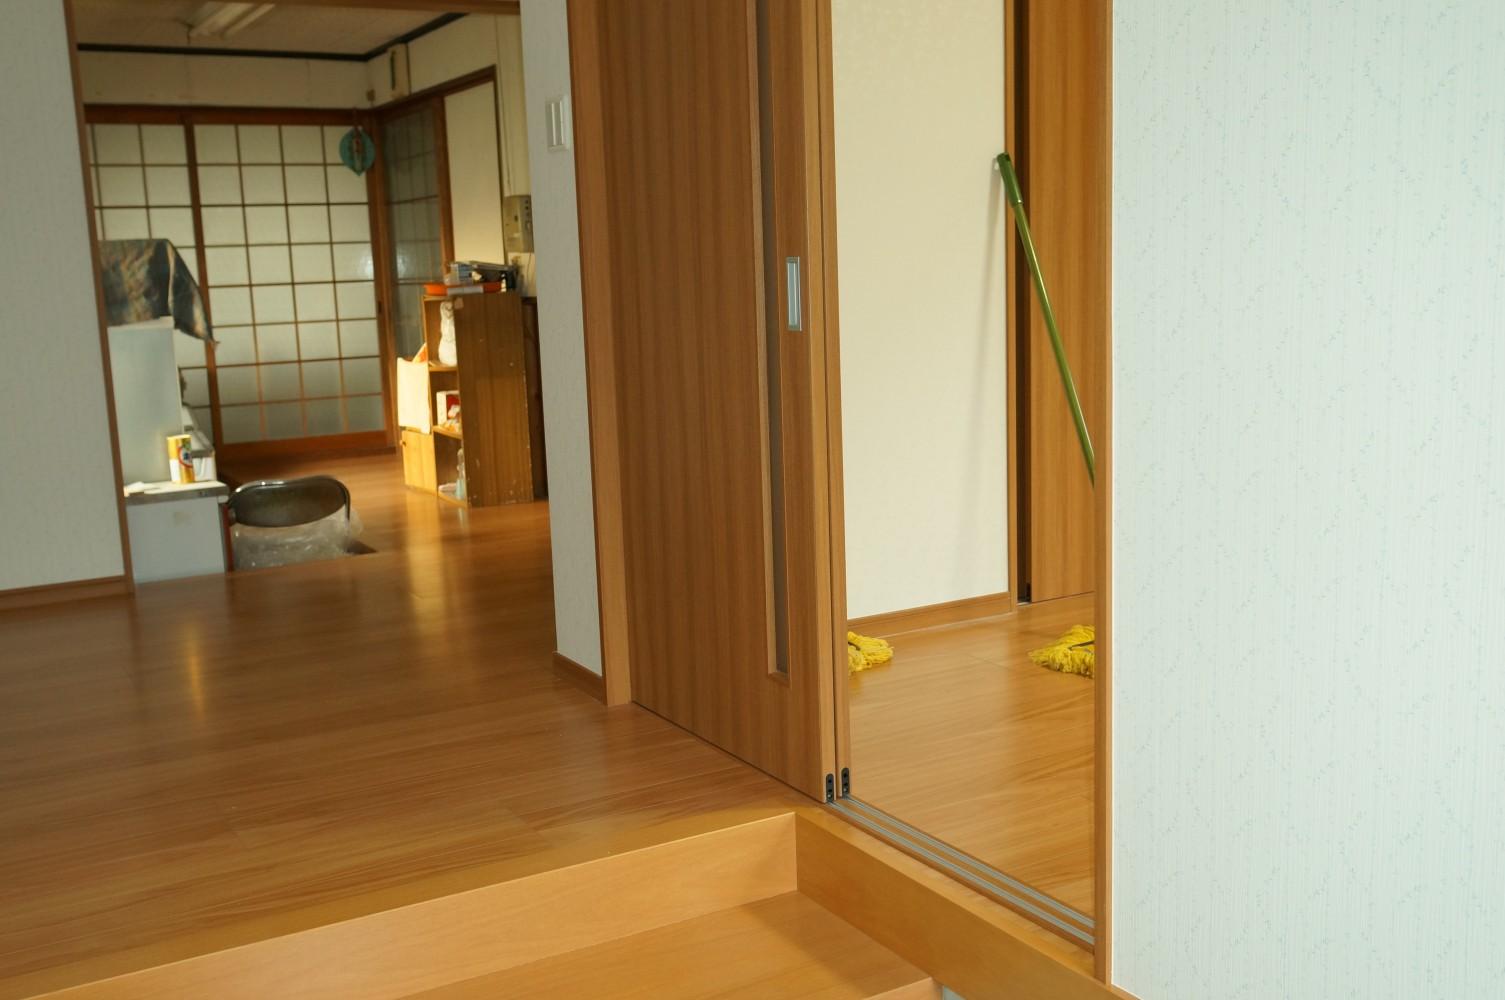 【西脇市リフォーム】居室追加工事施工後